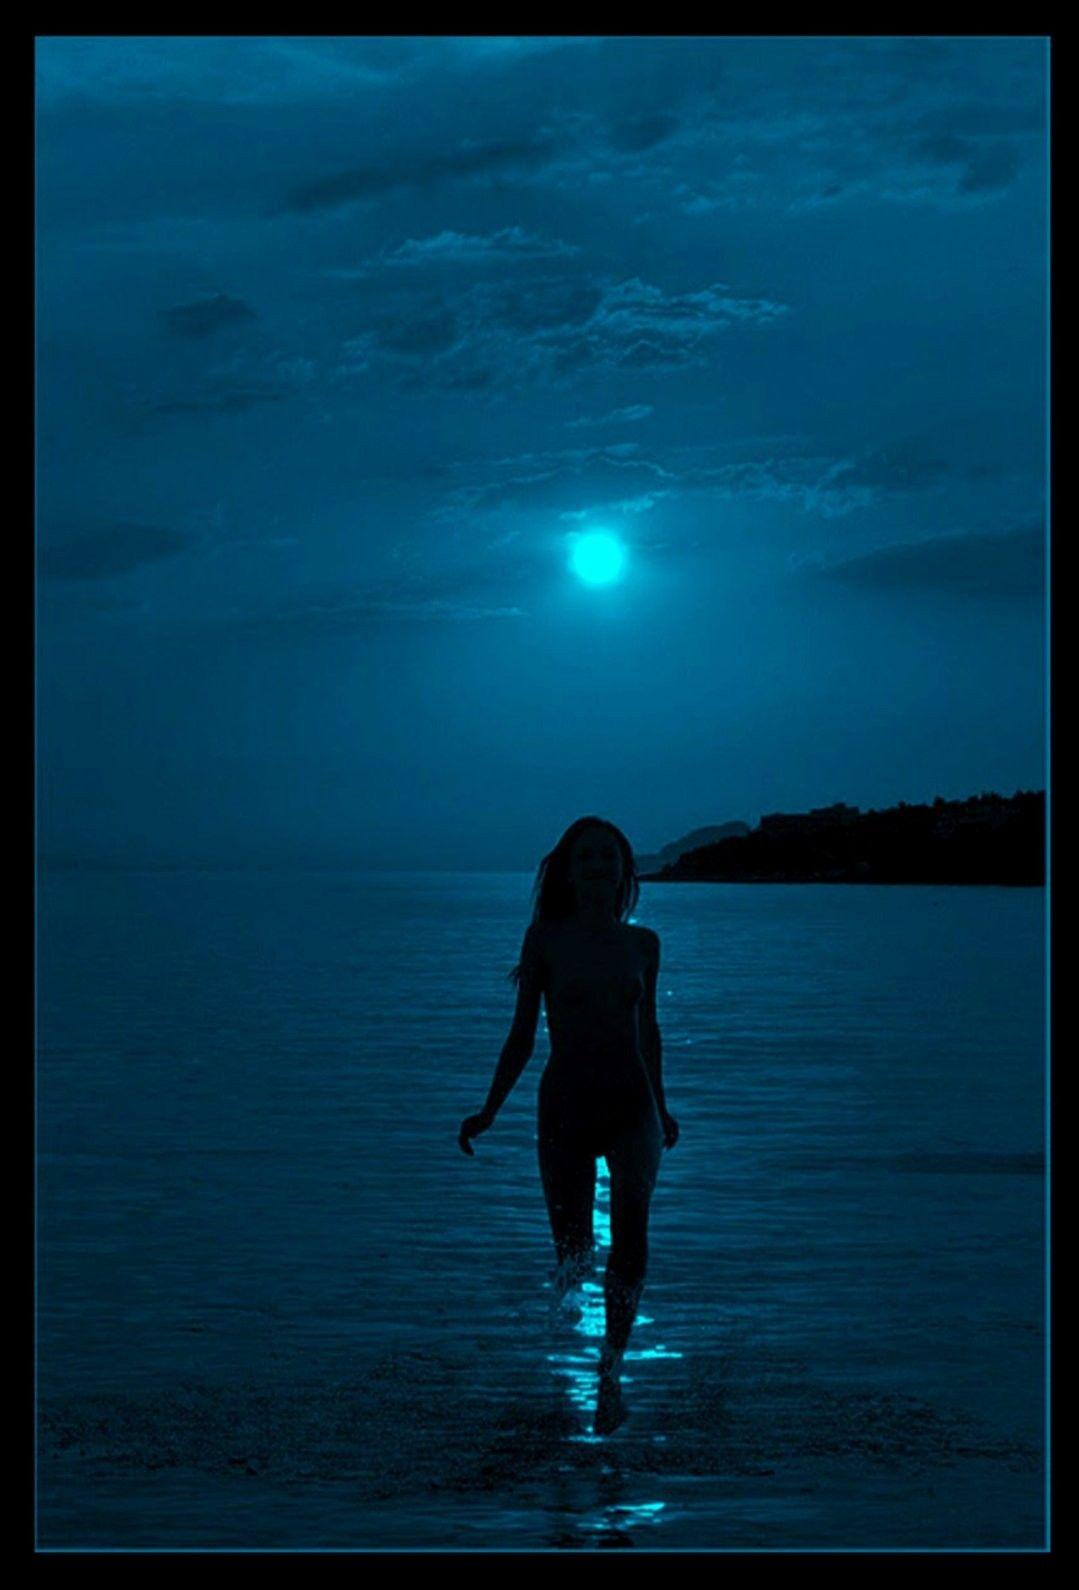 Pin by Javi manoatl on Luna Azul | Beautiful moon, Blue ...